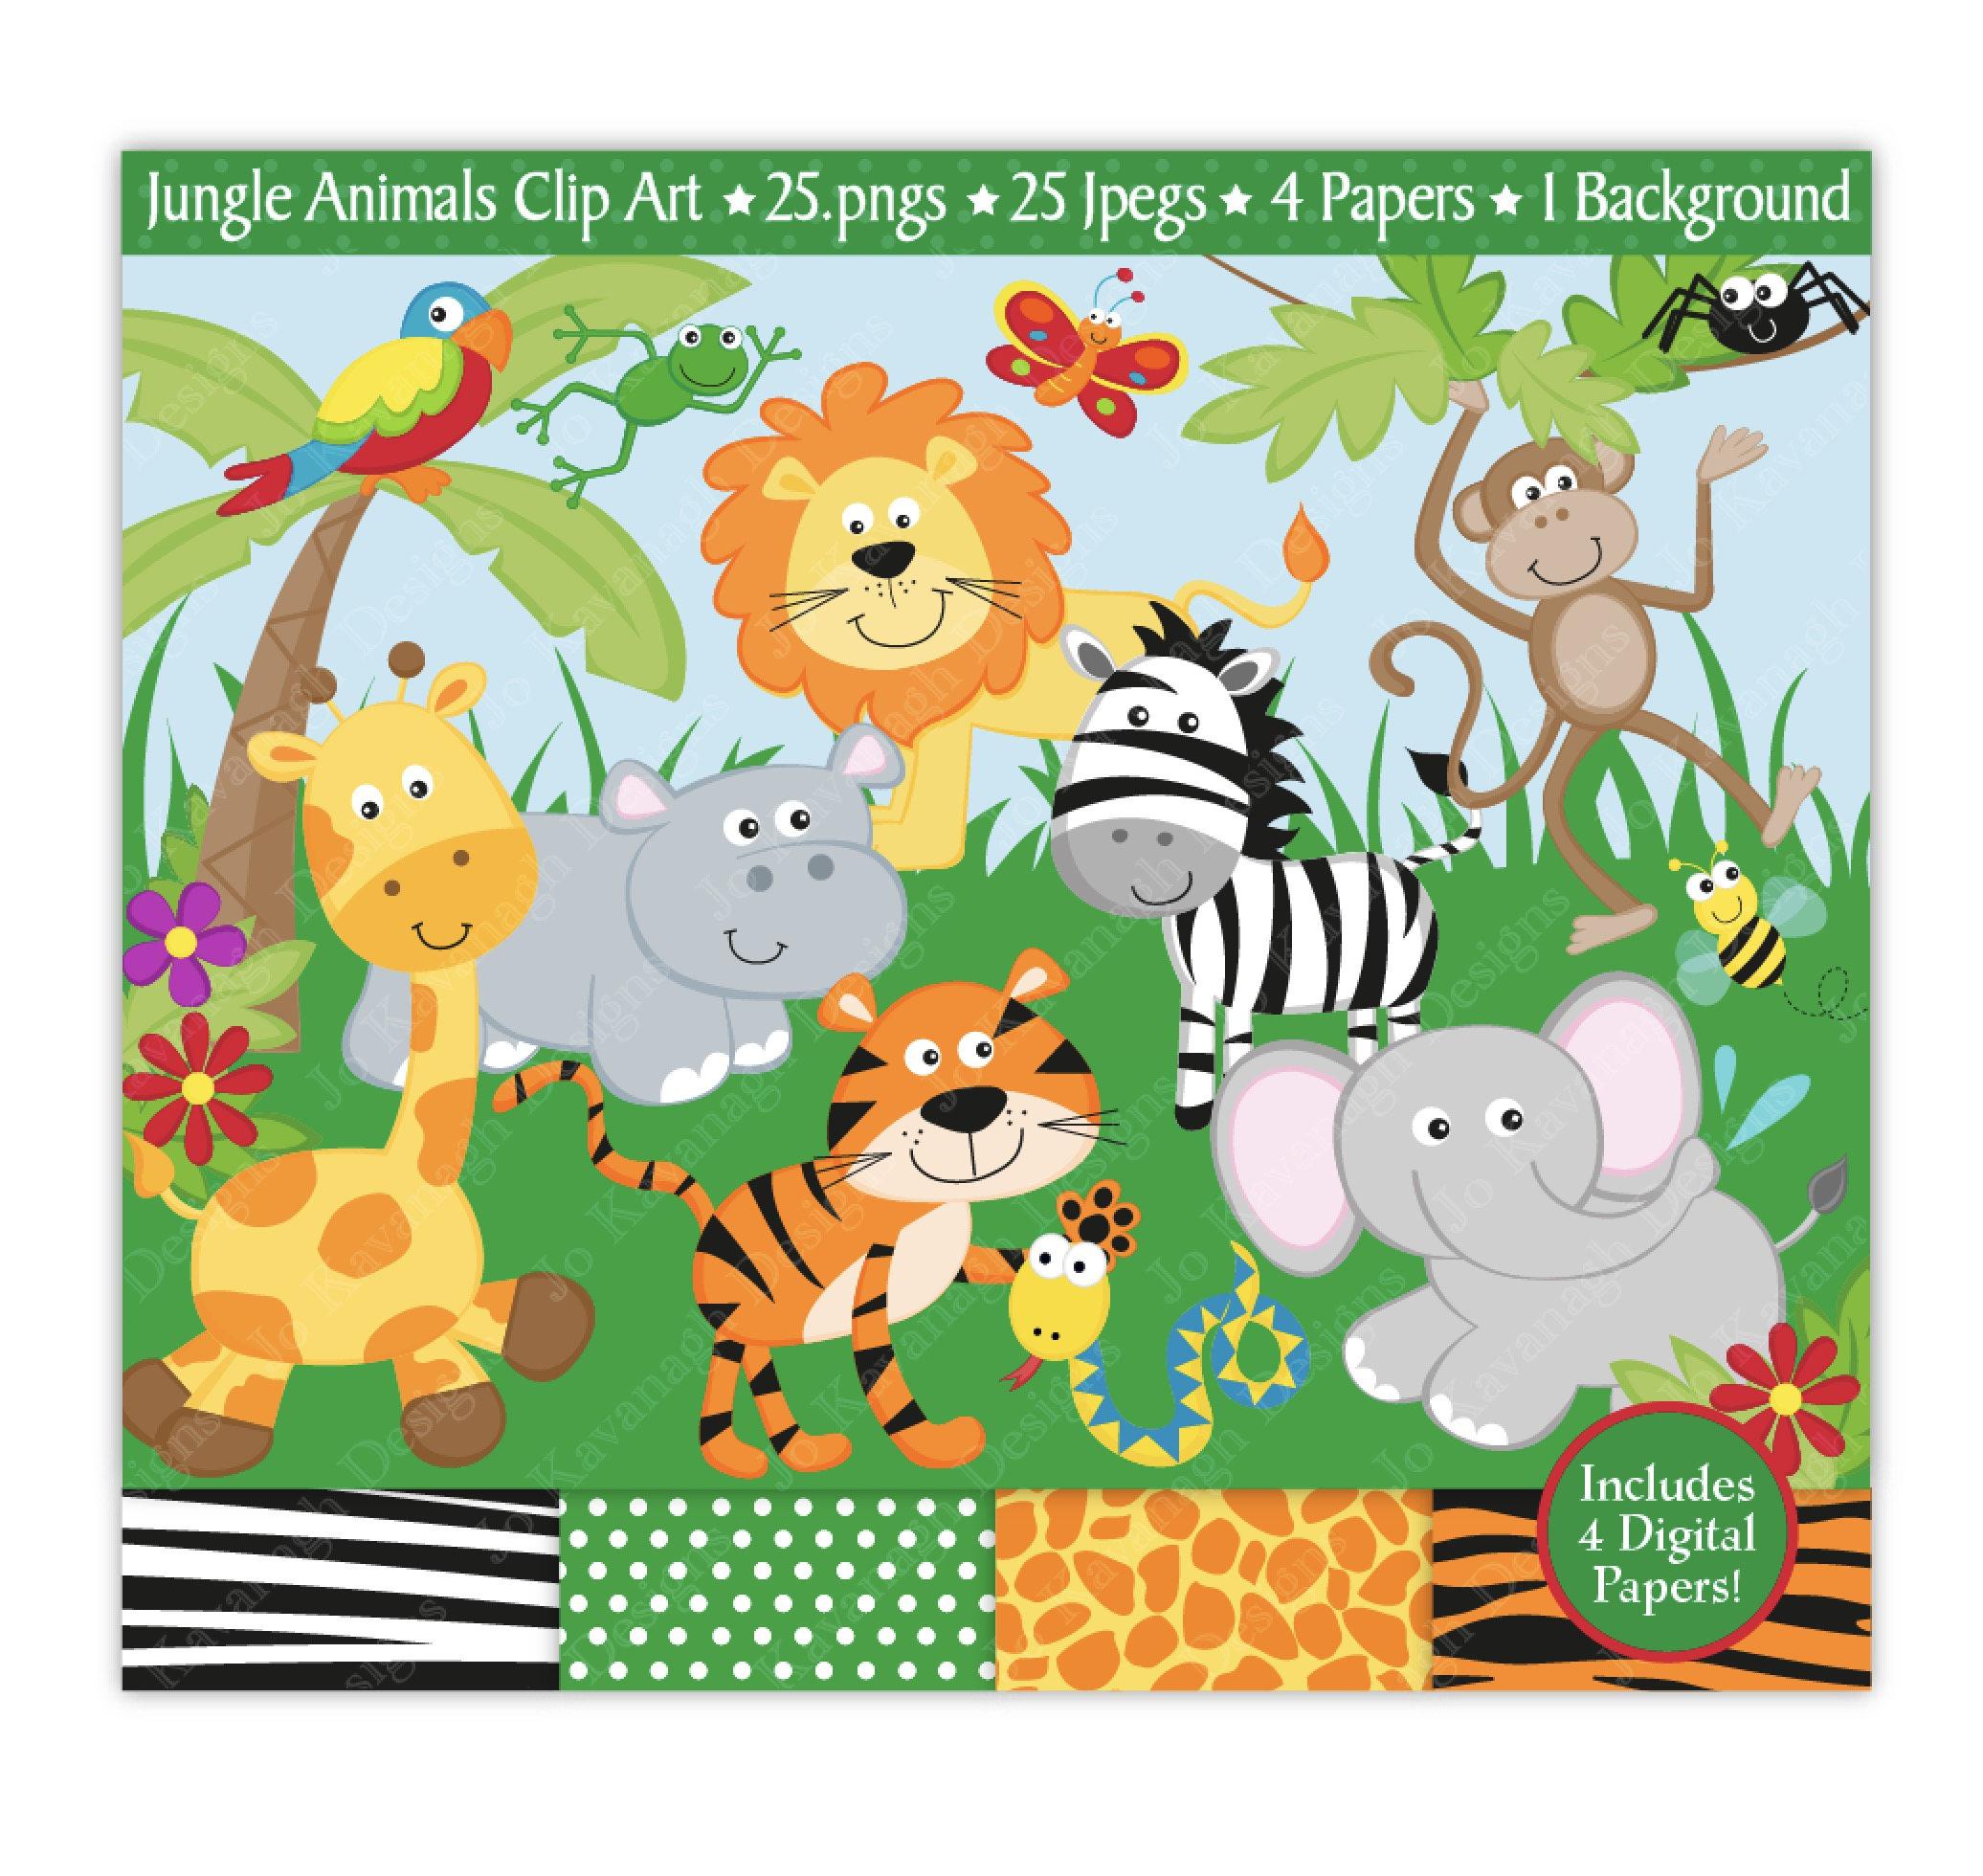 2072x1960 Jungle Clip Art, Jungle Digital Papers,jungle Clipart,jungle